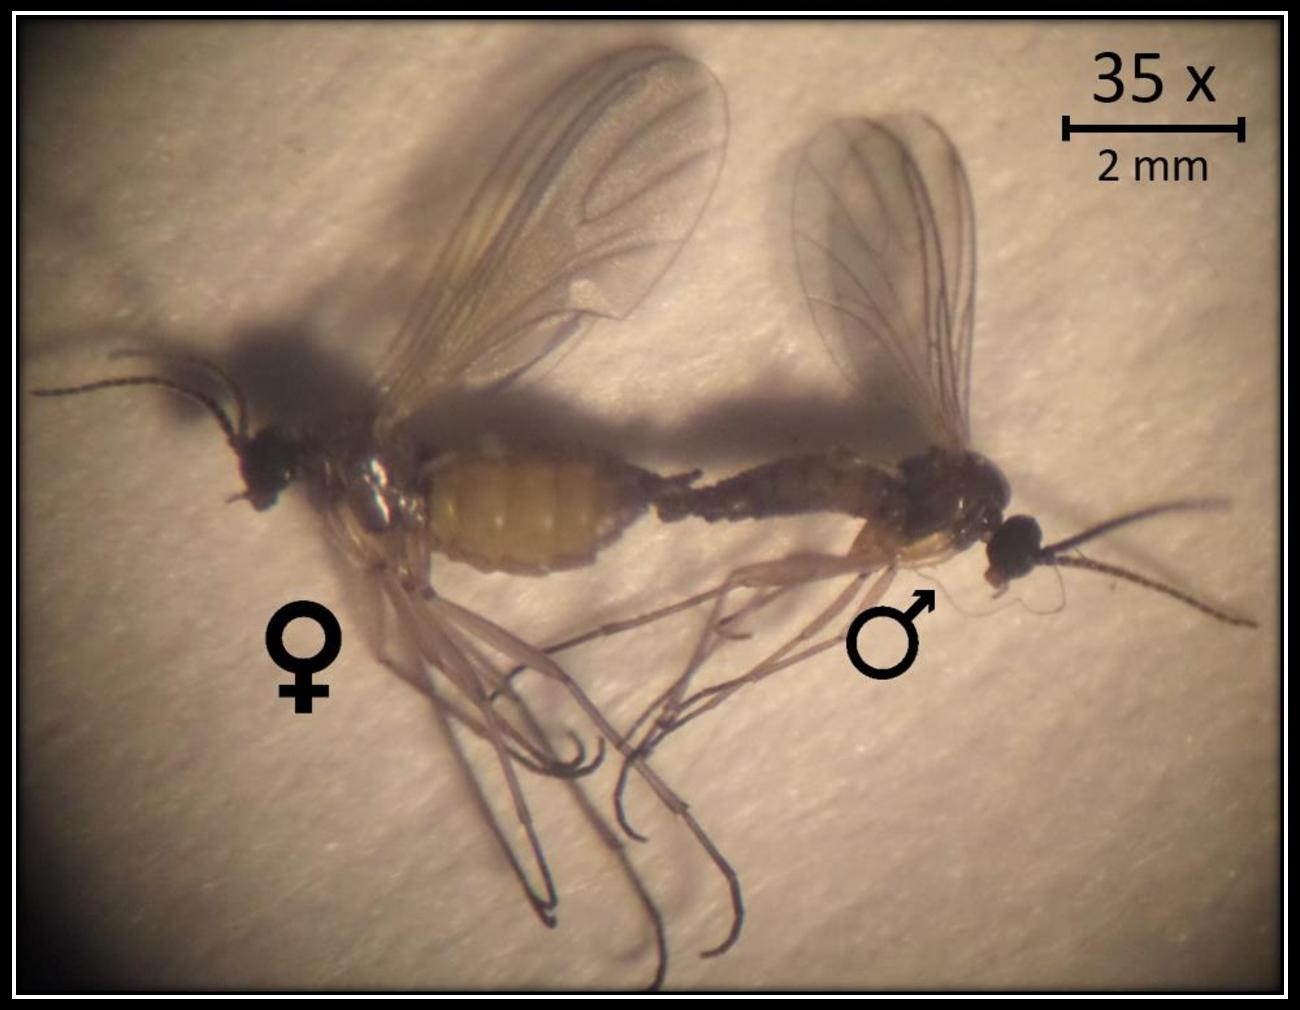 figure 1-1